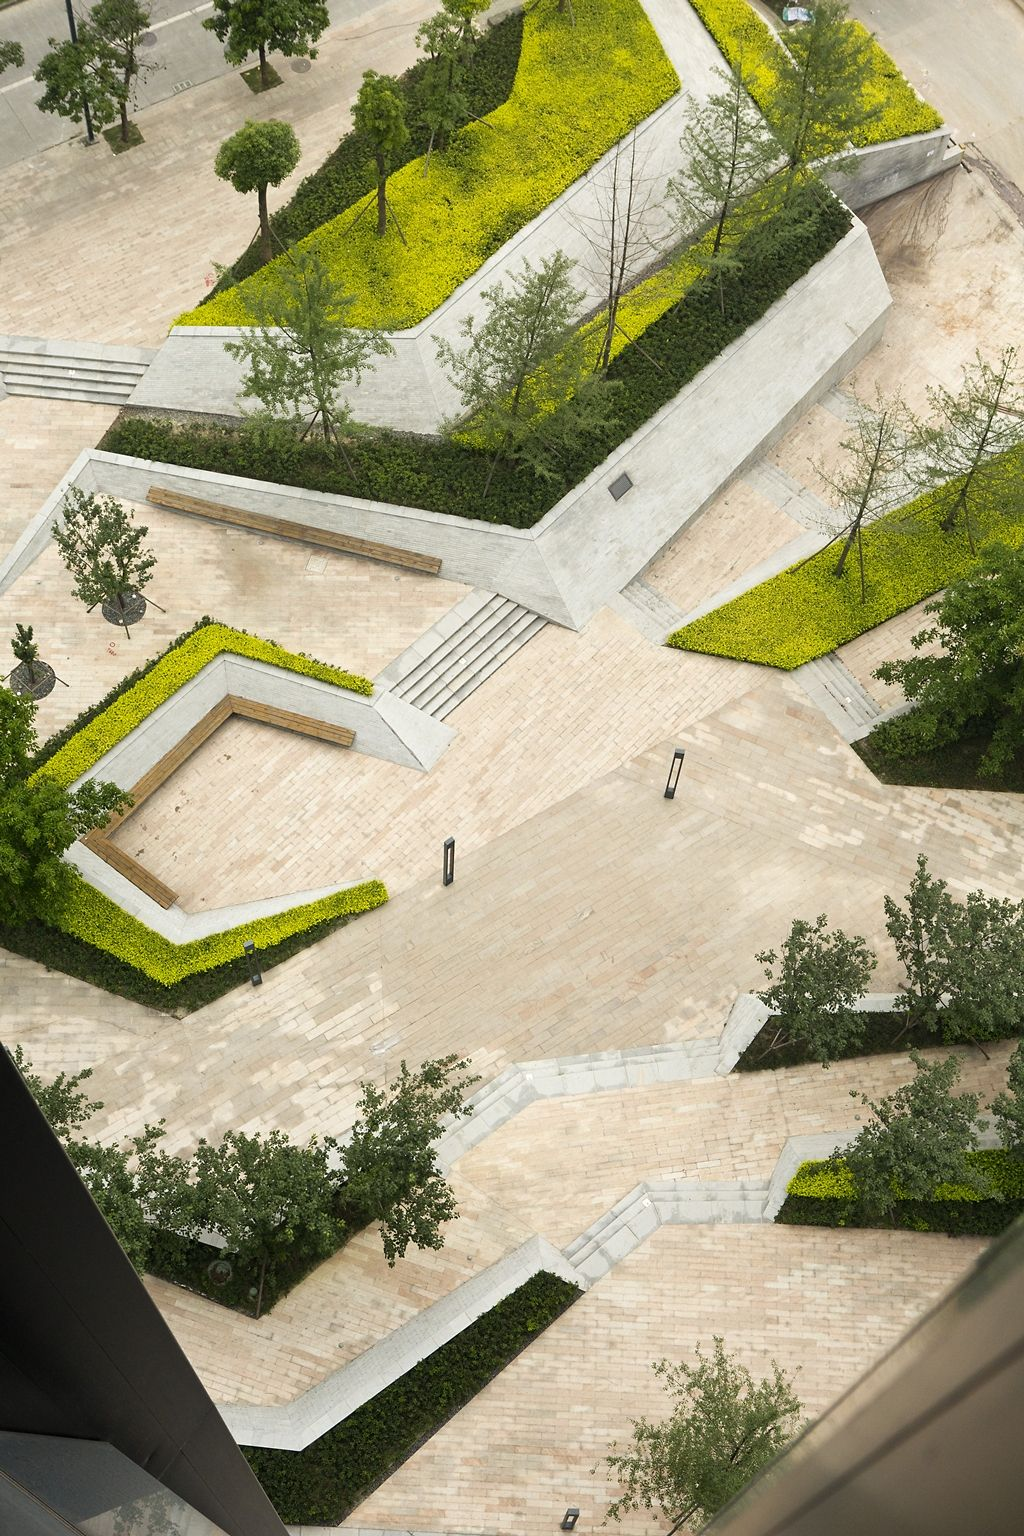 Fantasia mixed use landscape public spaces chengdu and for Spaces landscape architecture